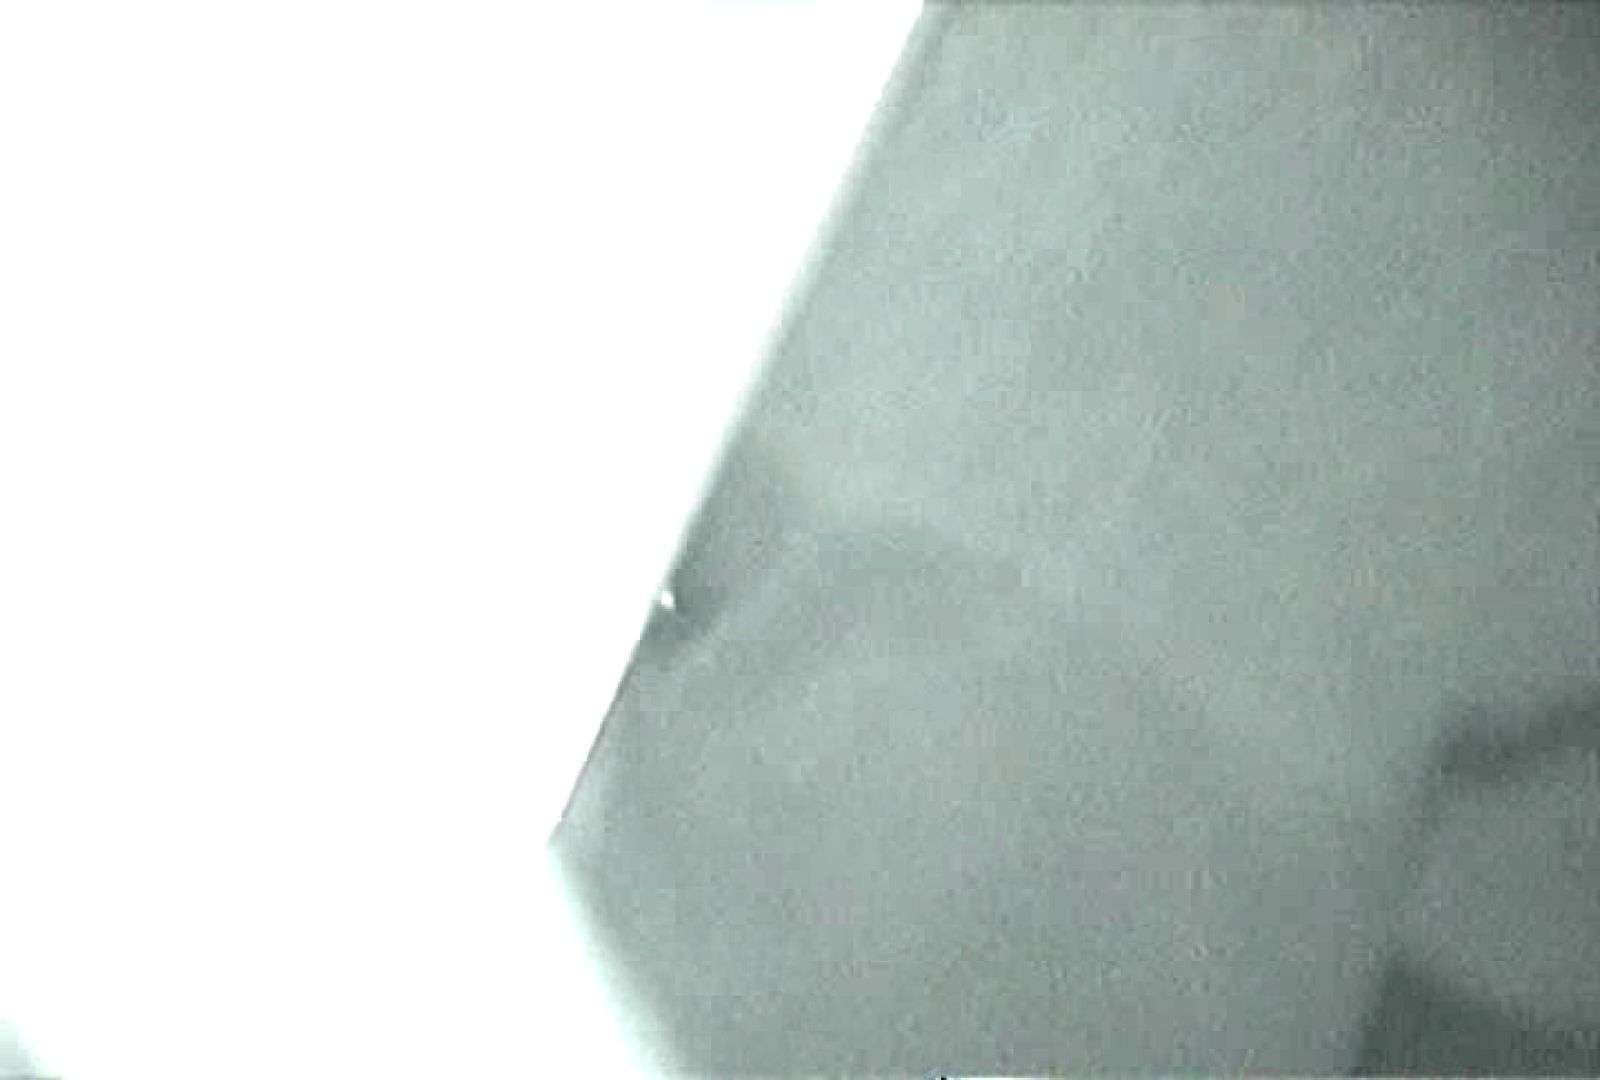 充血監督の深夜の運動会Vol.89 熟女 エロ無料画像 55PIX 19